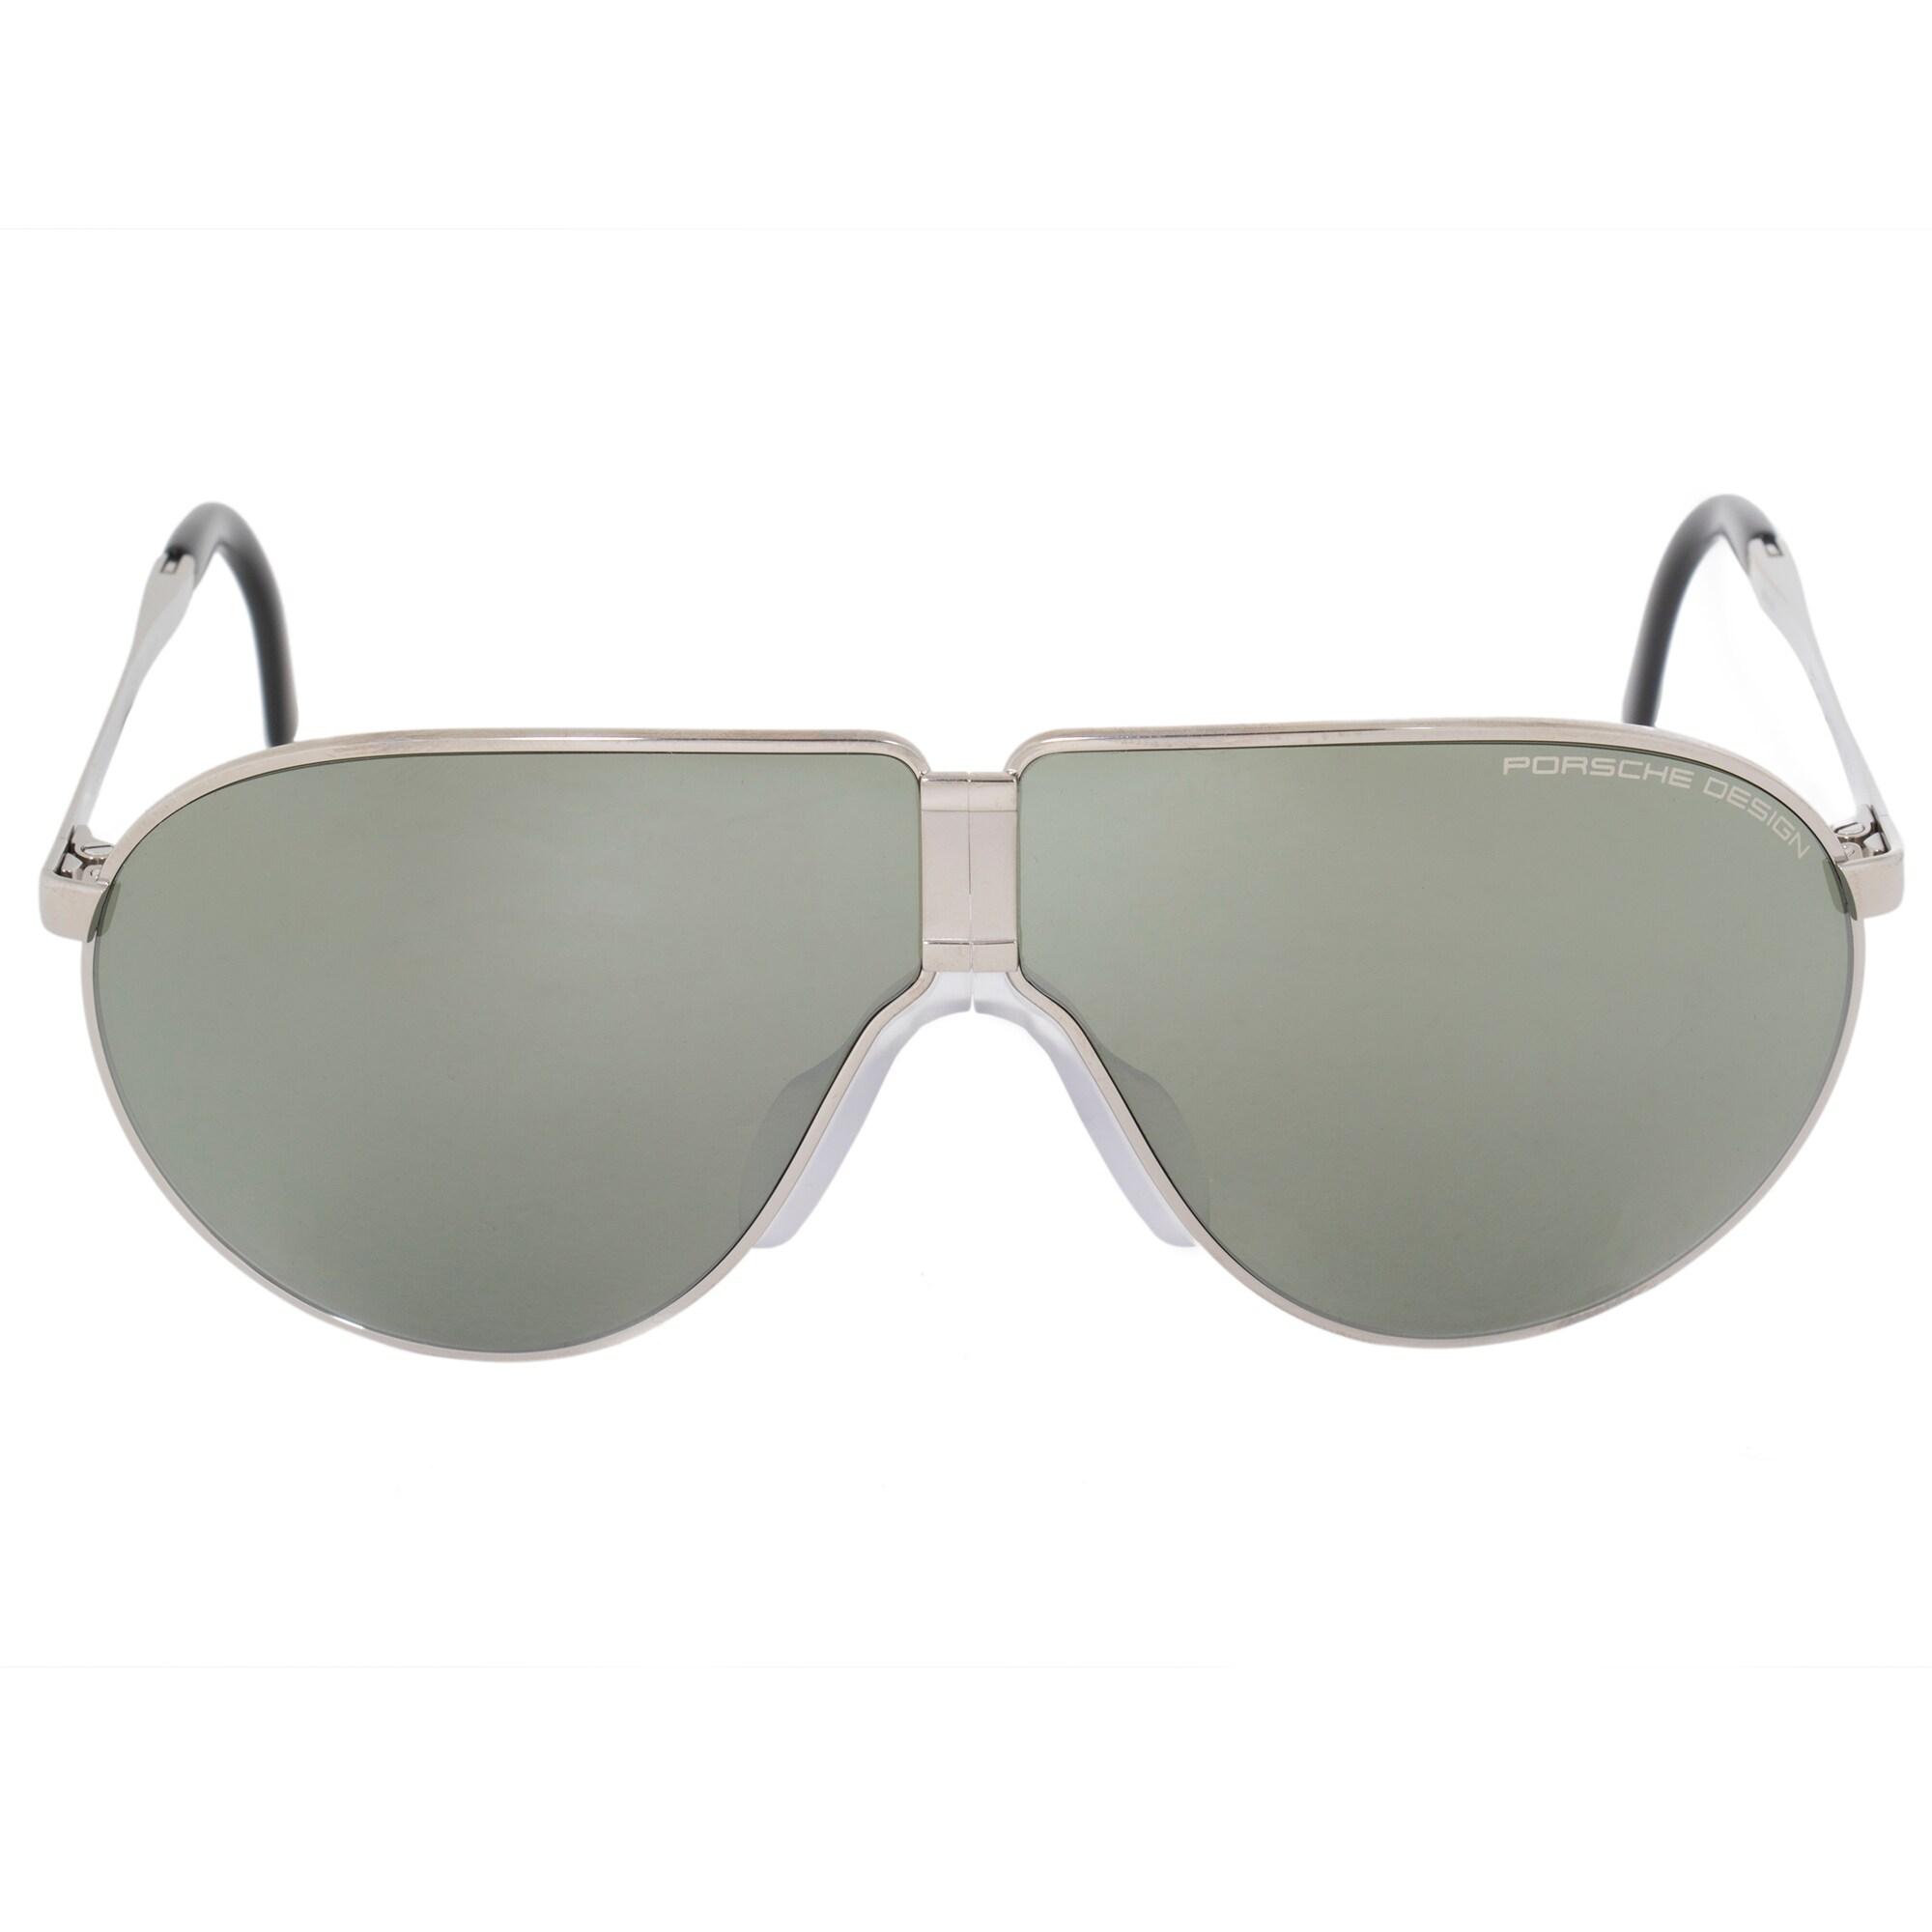 2ec38e6cc7 Porsche design heritage unbreakable foldable sunglasses for men titanium  frame olive silver mirror jpg 2000x2000 Olive